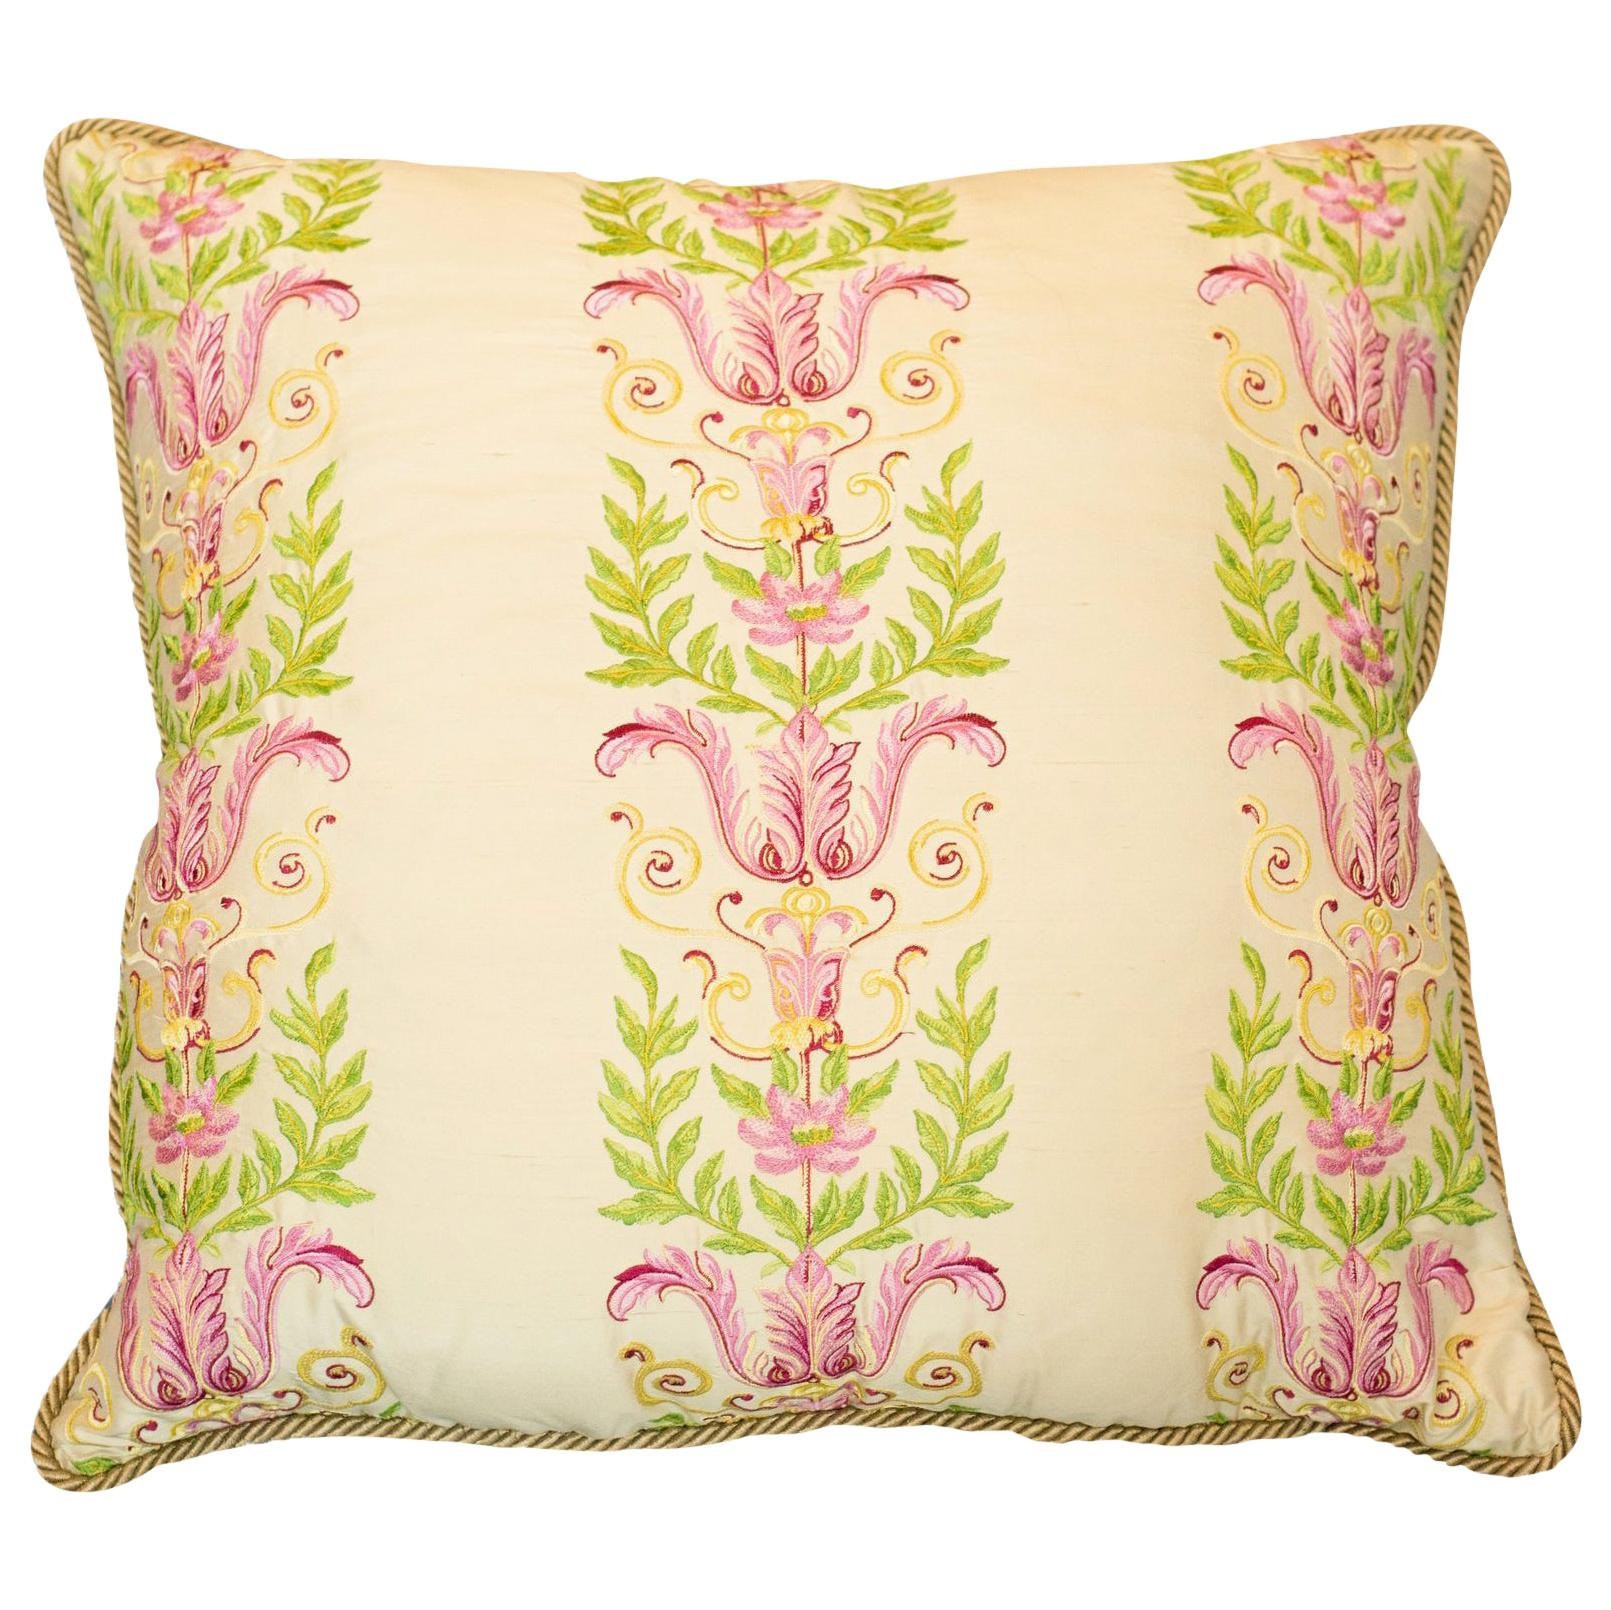 Studio Maison Nurita Embroidered Crème Silk and Cotton Velvet Pillow